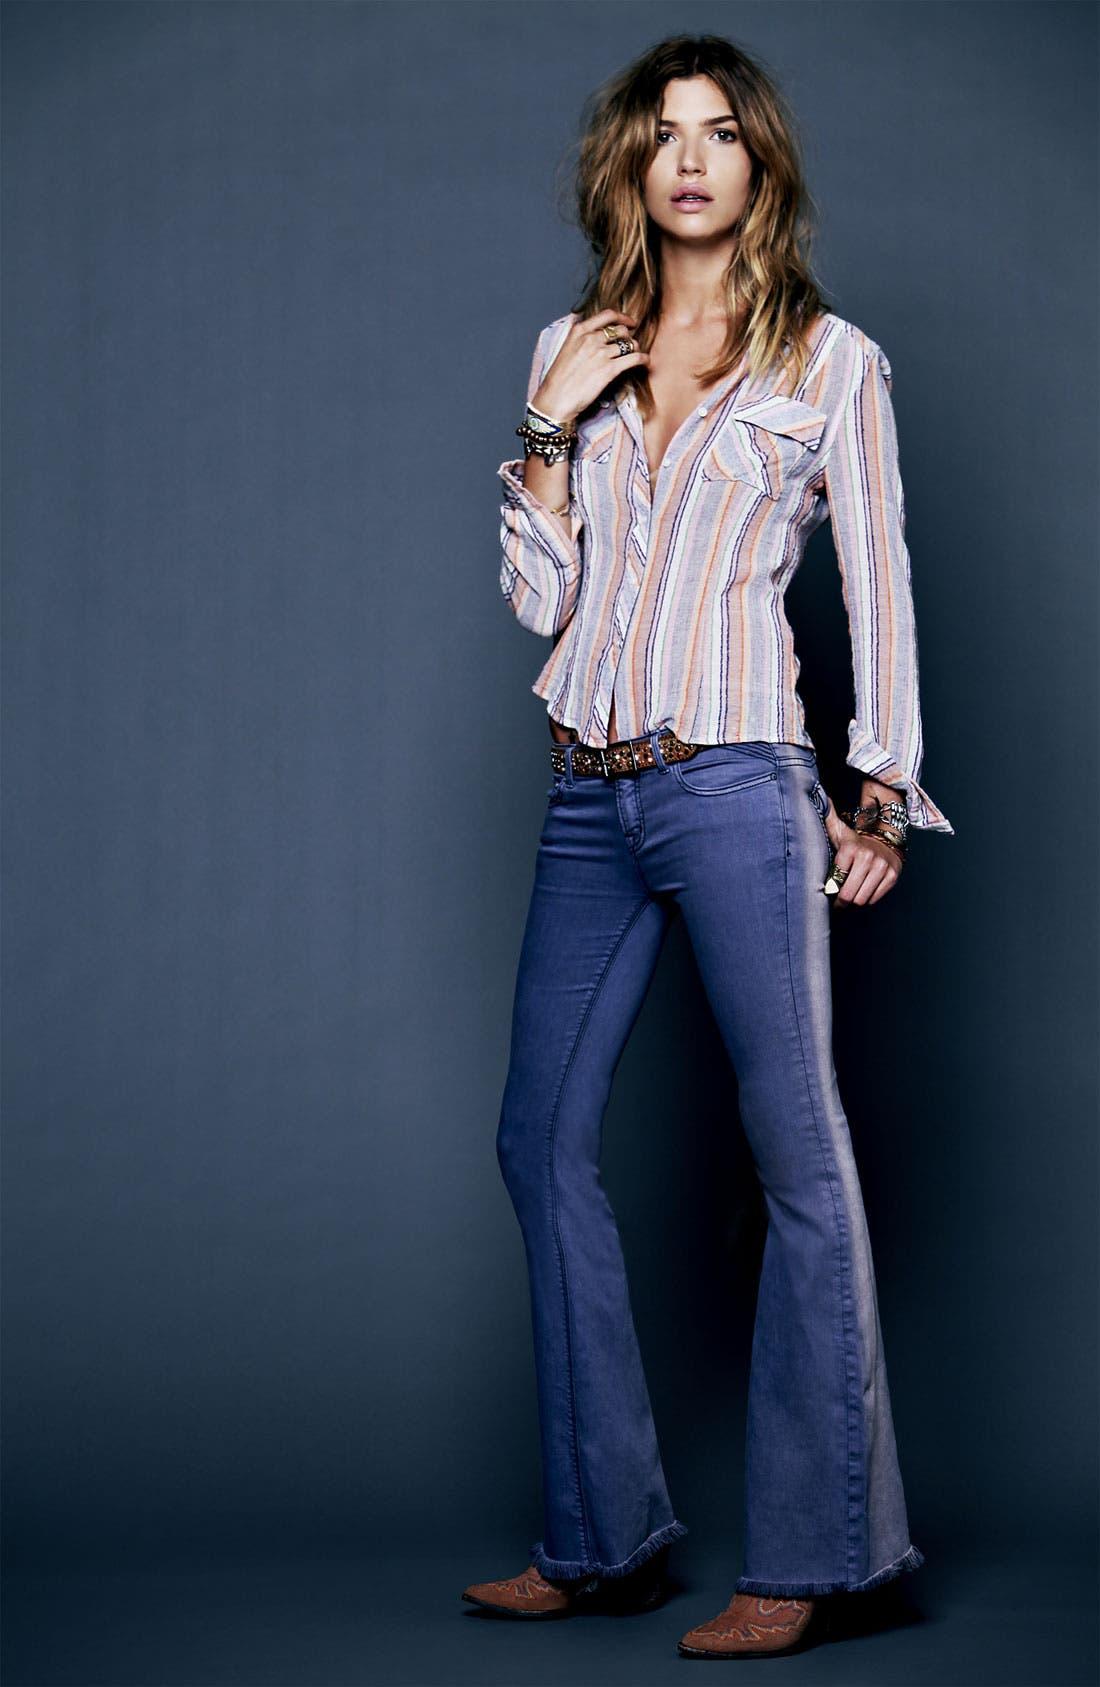 Main Image - Free People Shirt & Jeans